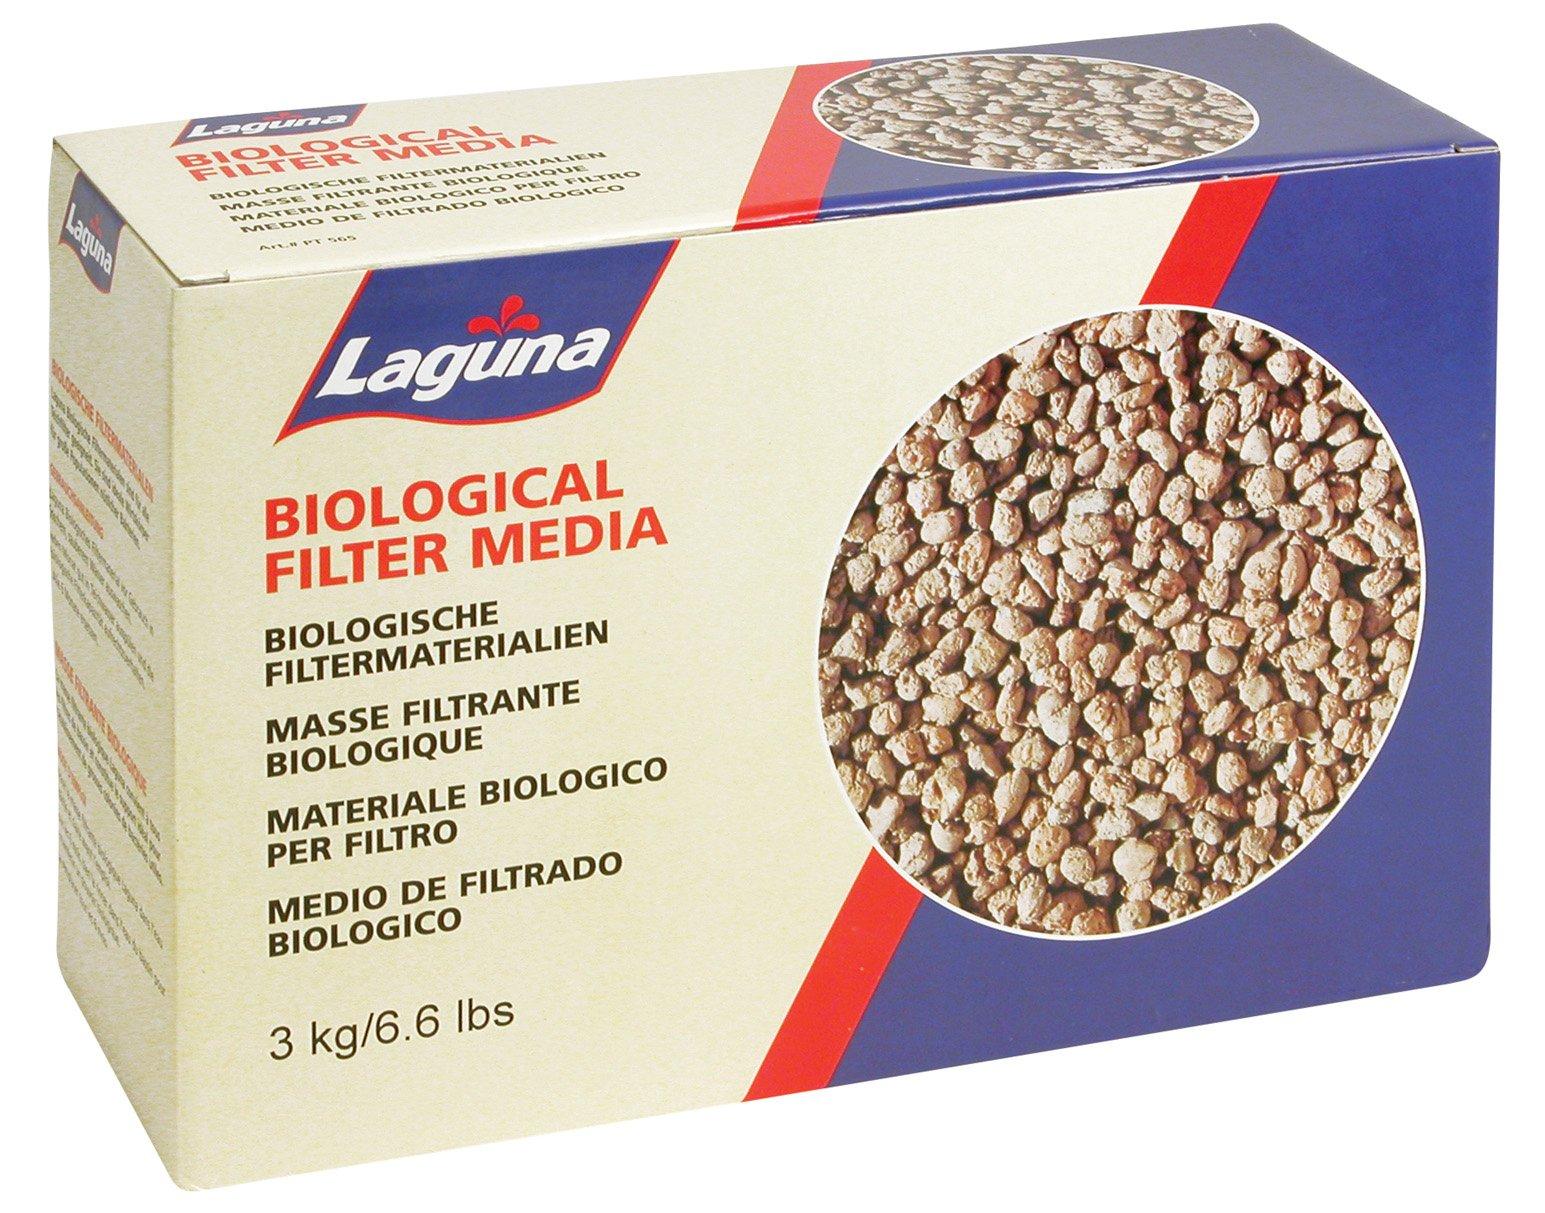 Laguna PowerFlo 1000 Biological Filter Media, 6.6-Pound